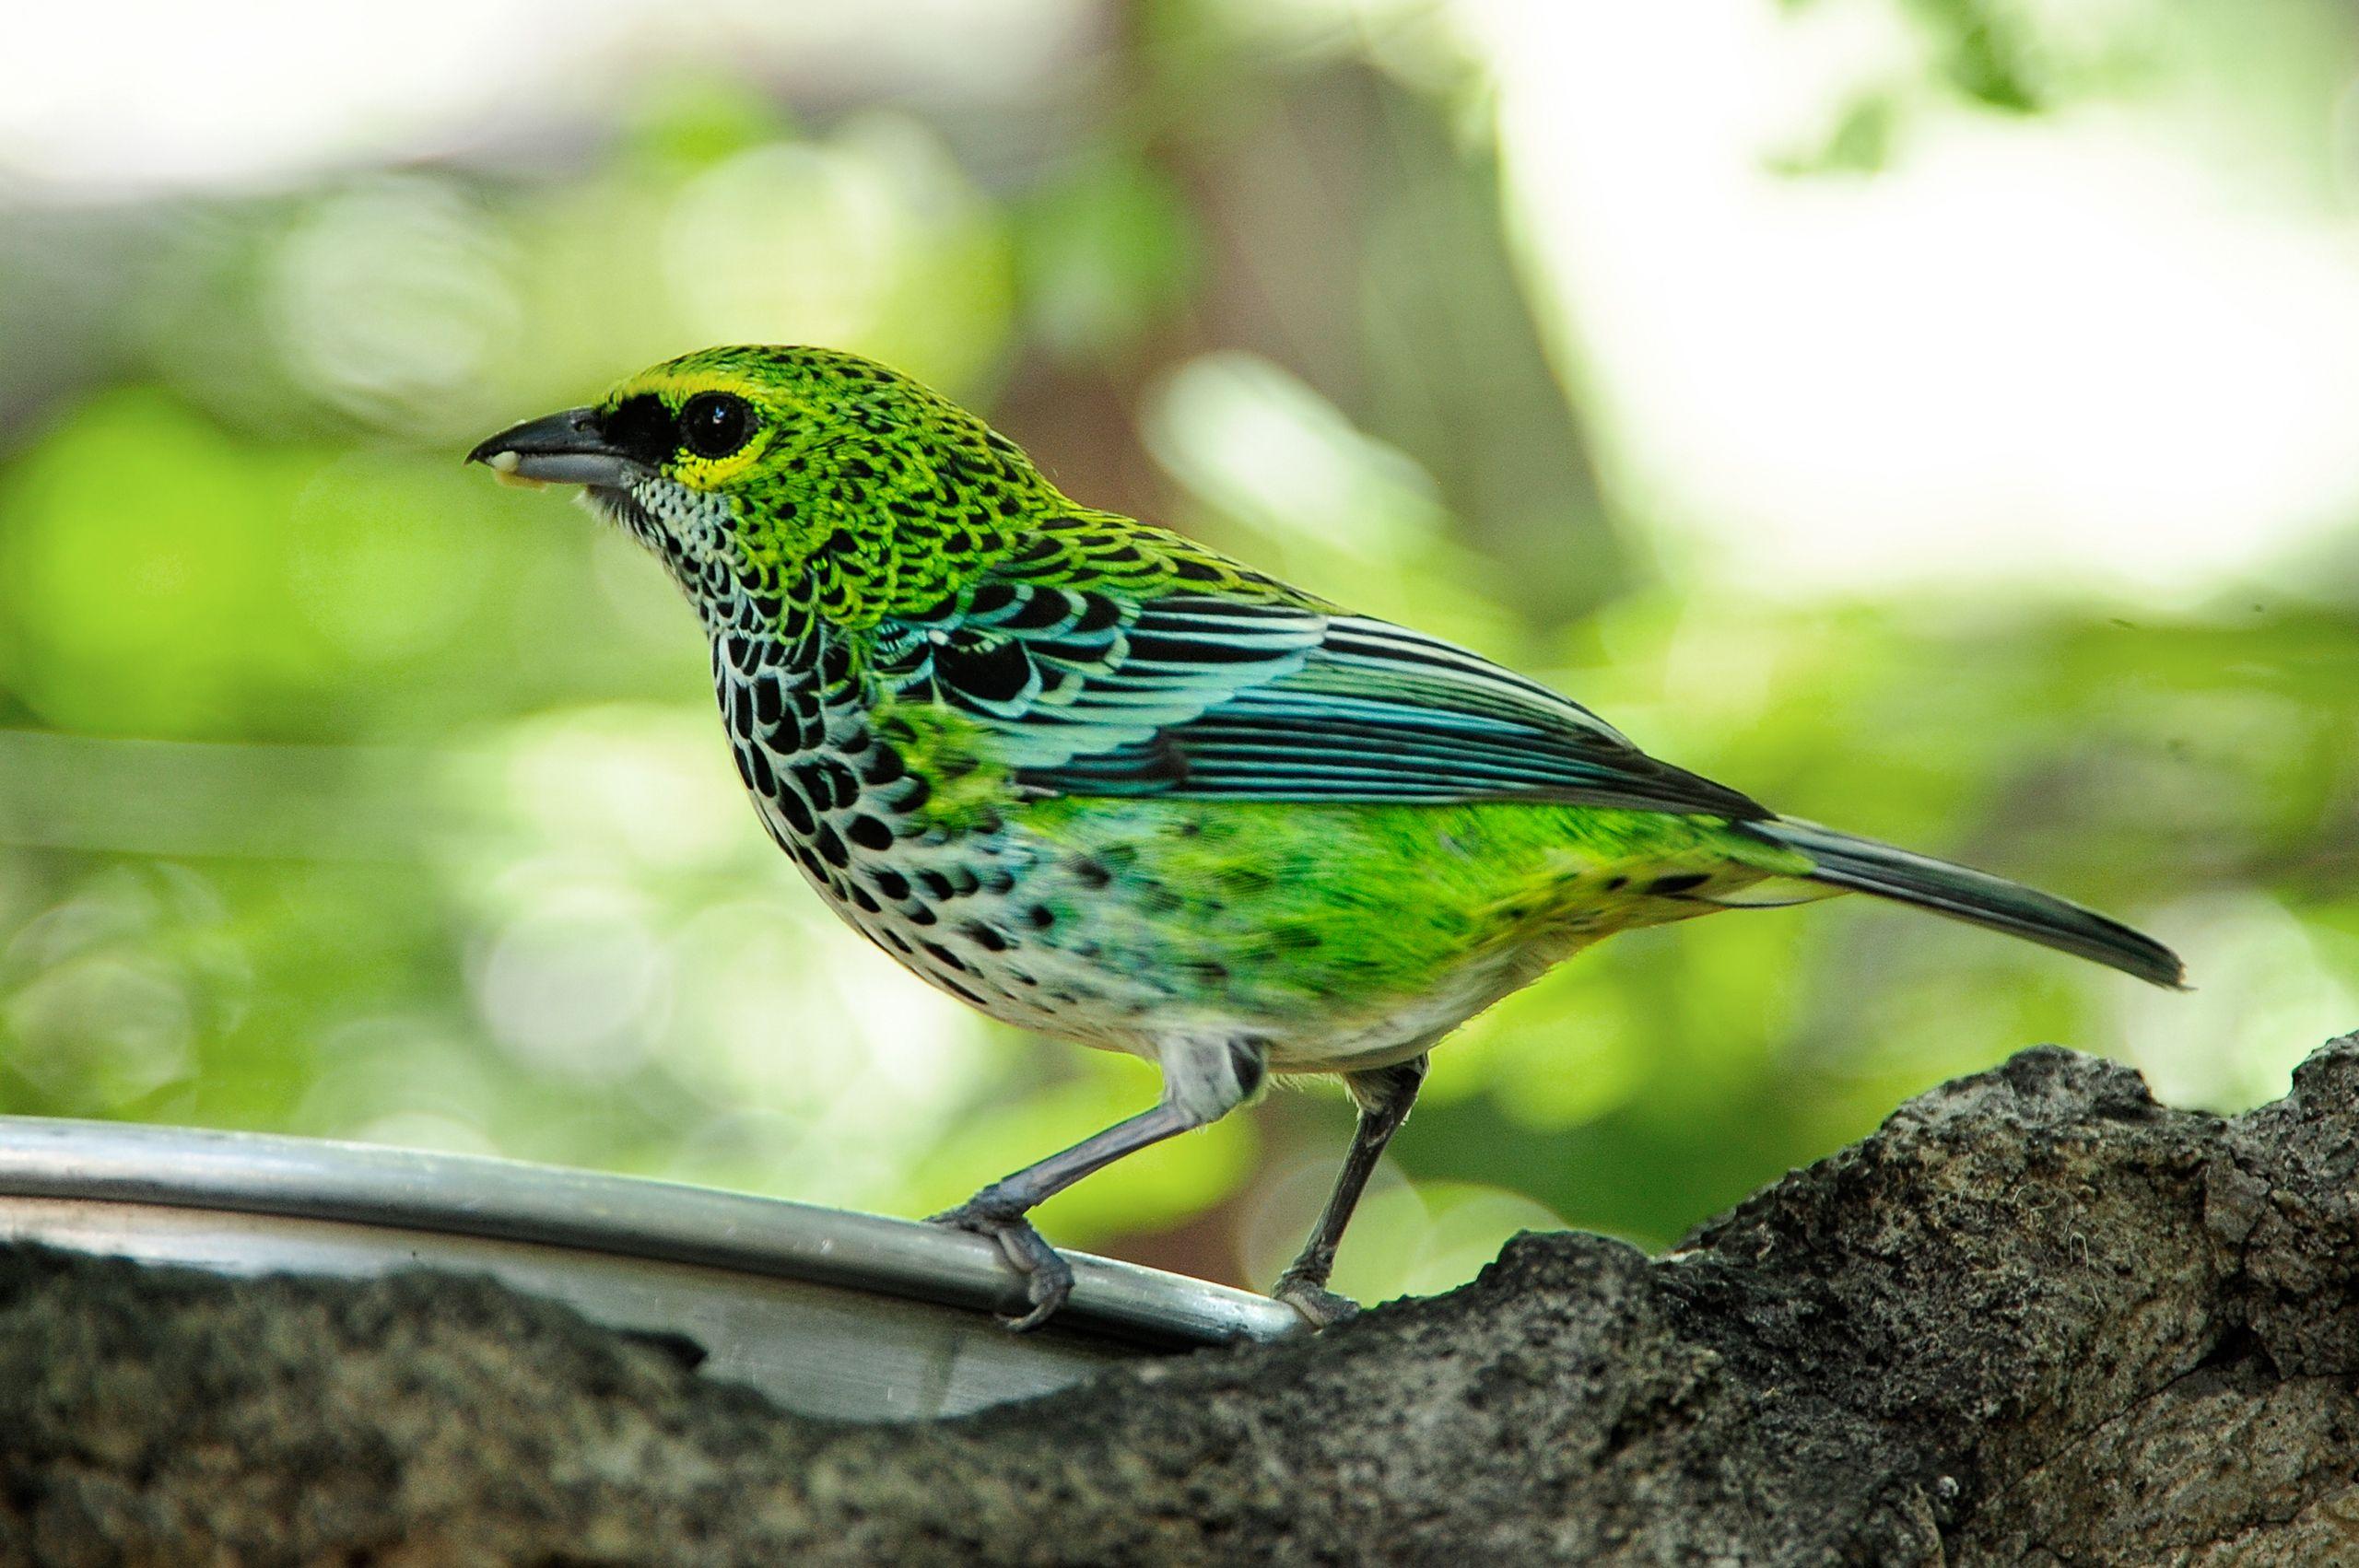 Blue and Green Bird